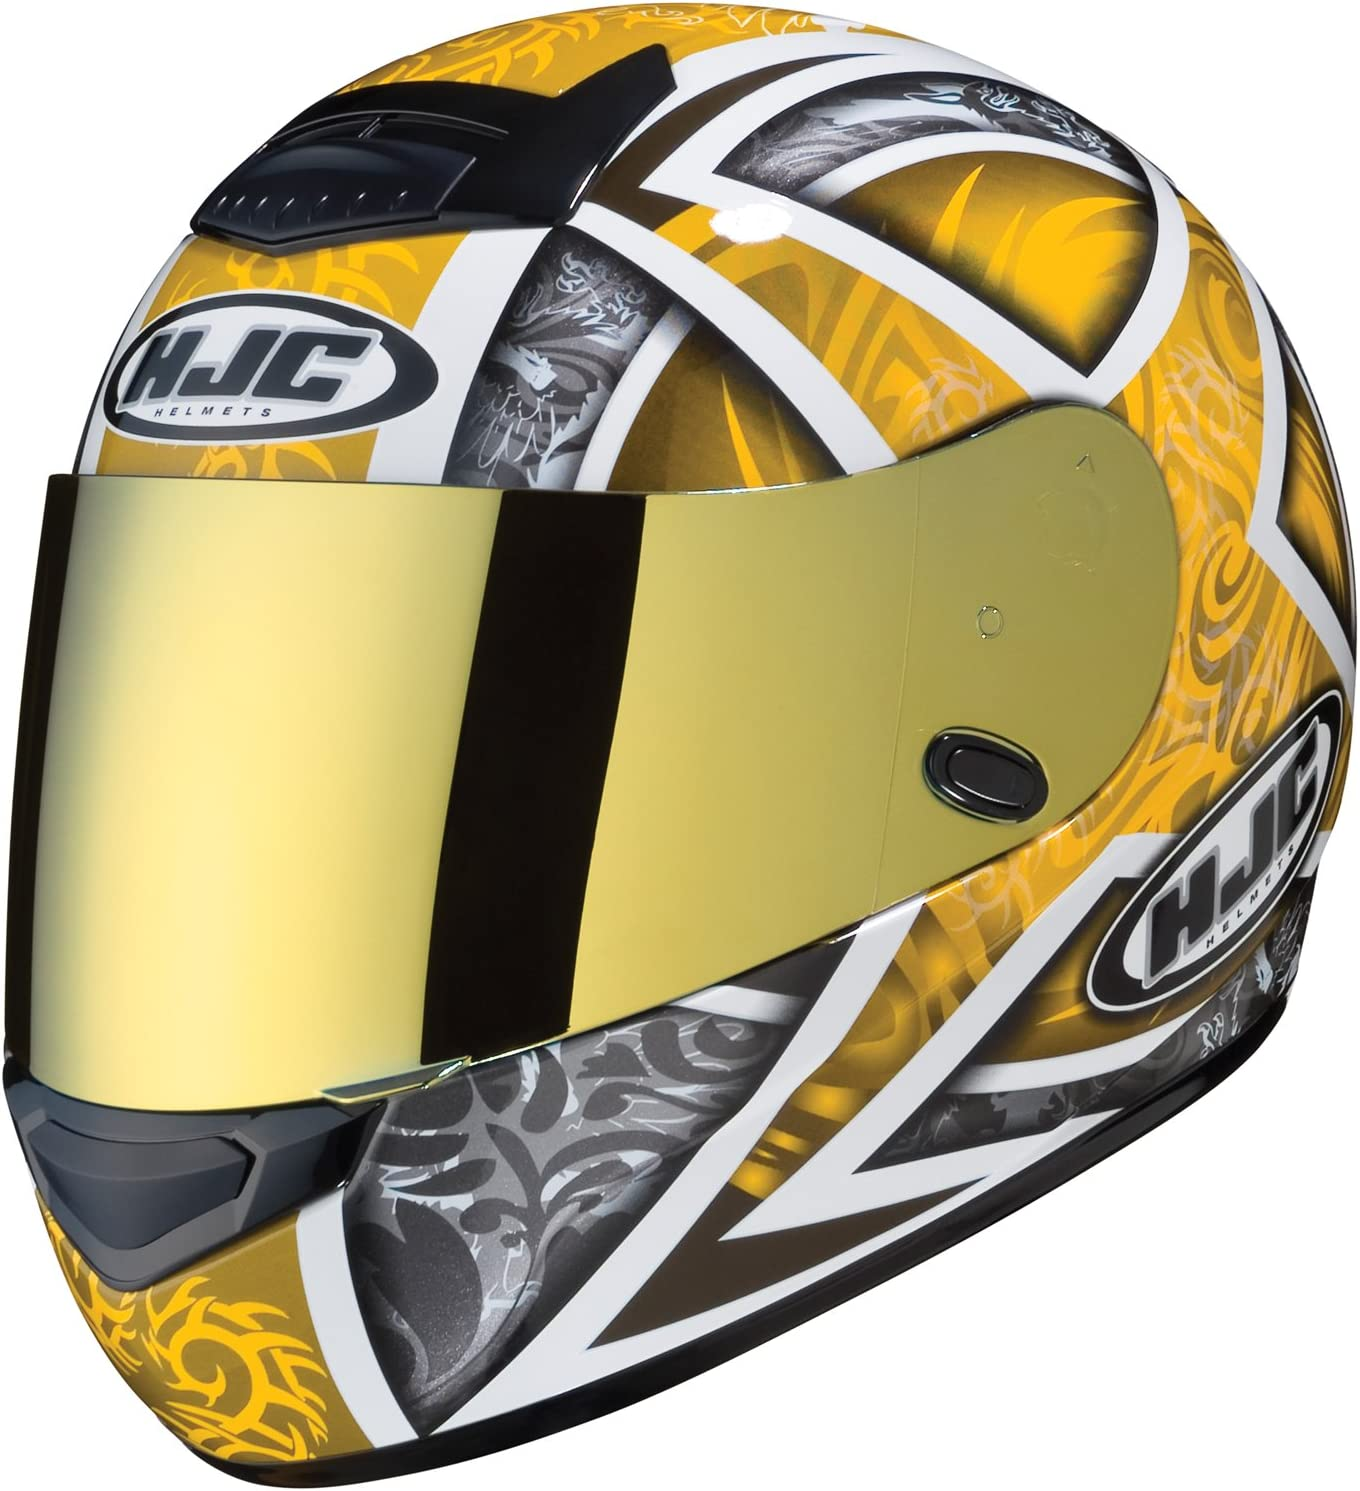 HJC HJ-09 Pinlock Anti-Fog Lens FS-10 Road Race Motorcycle Helmet Accessories One Size Fits Most Clear